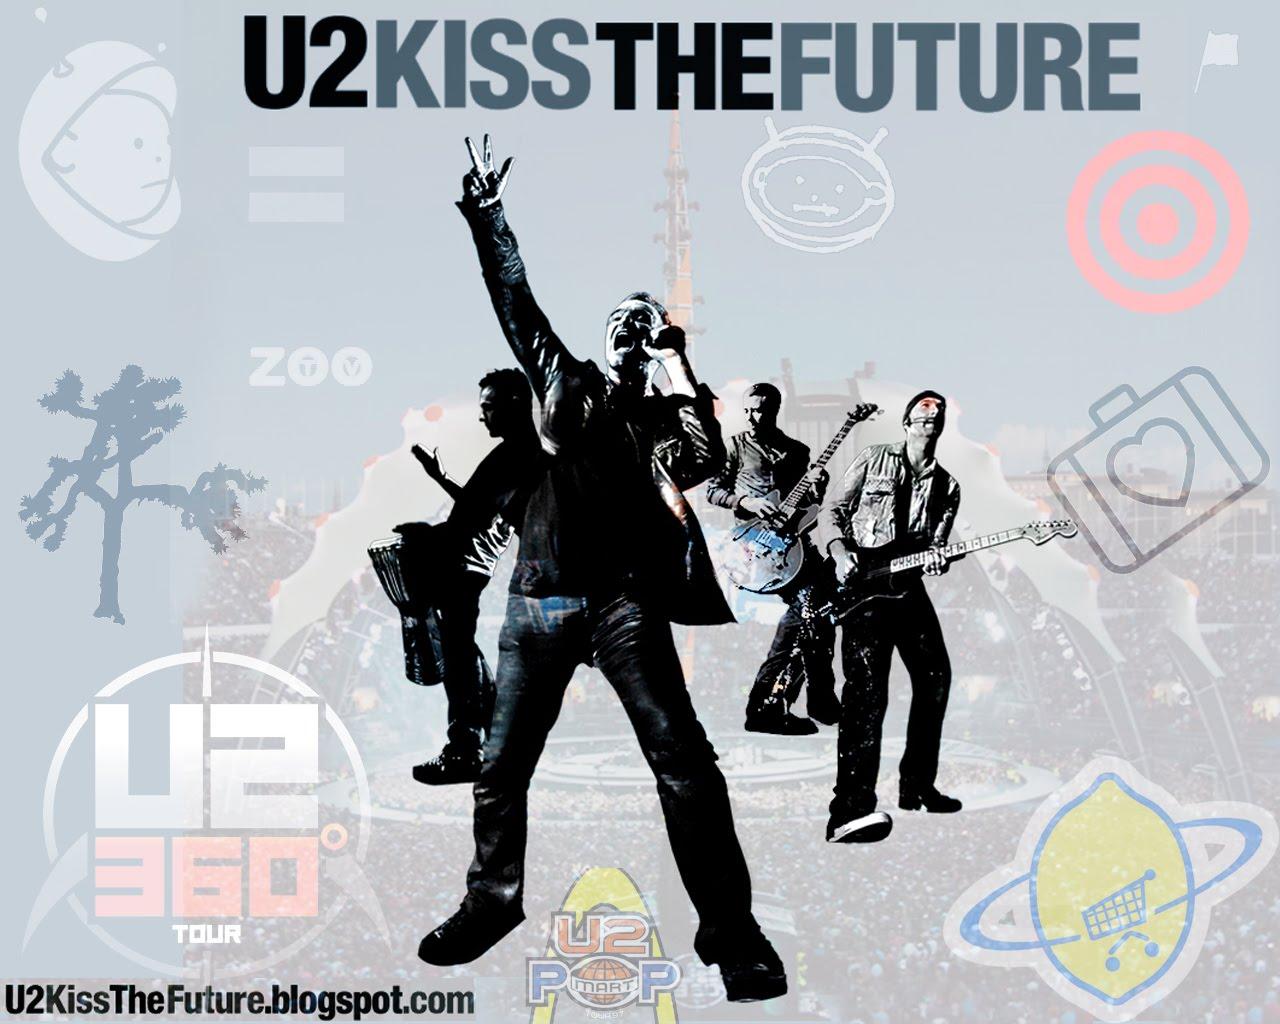 u2 kiss the future - photo #1